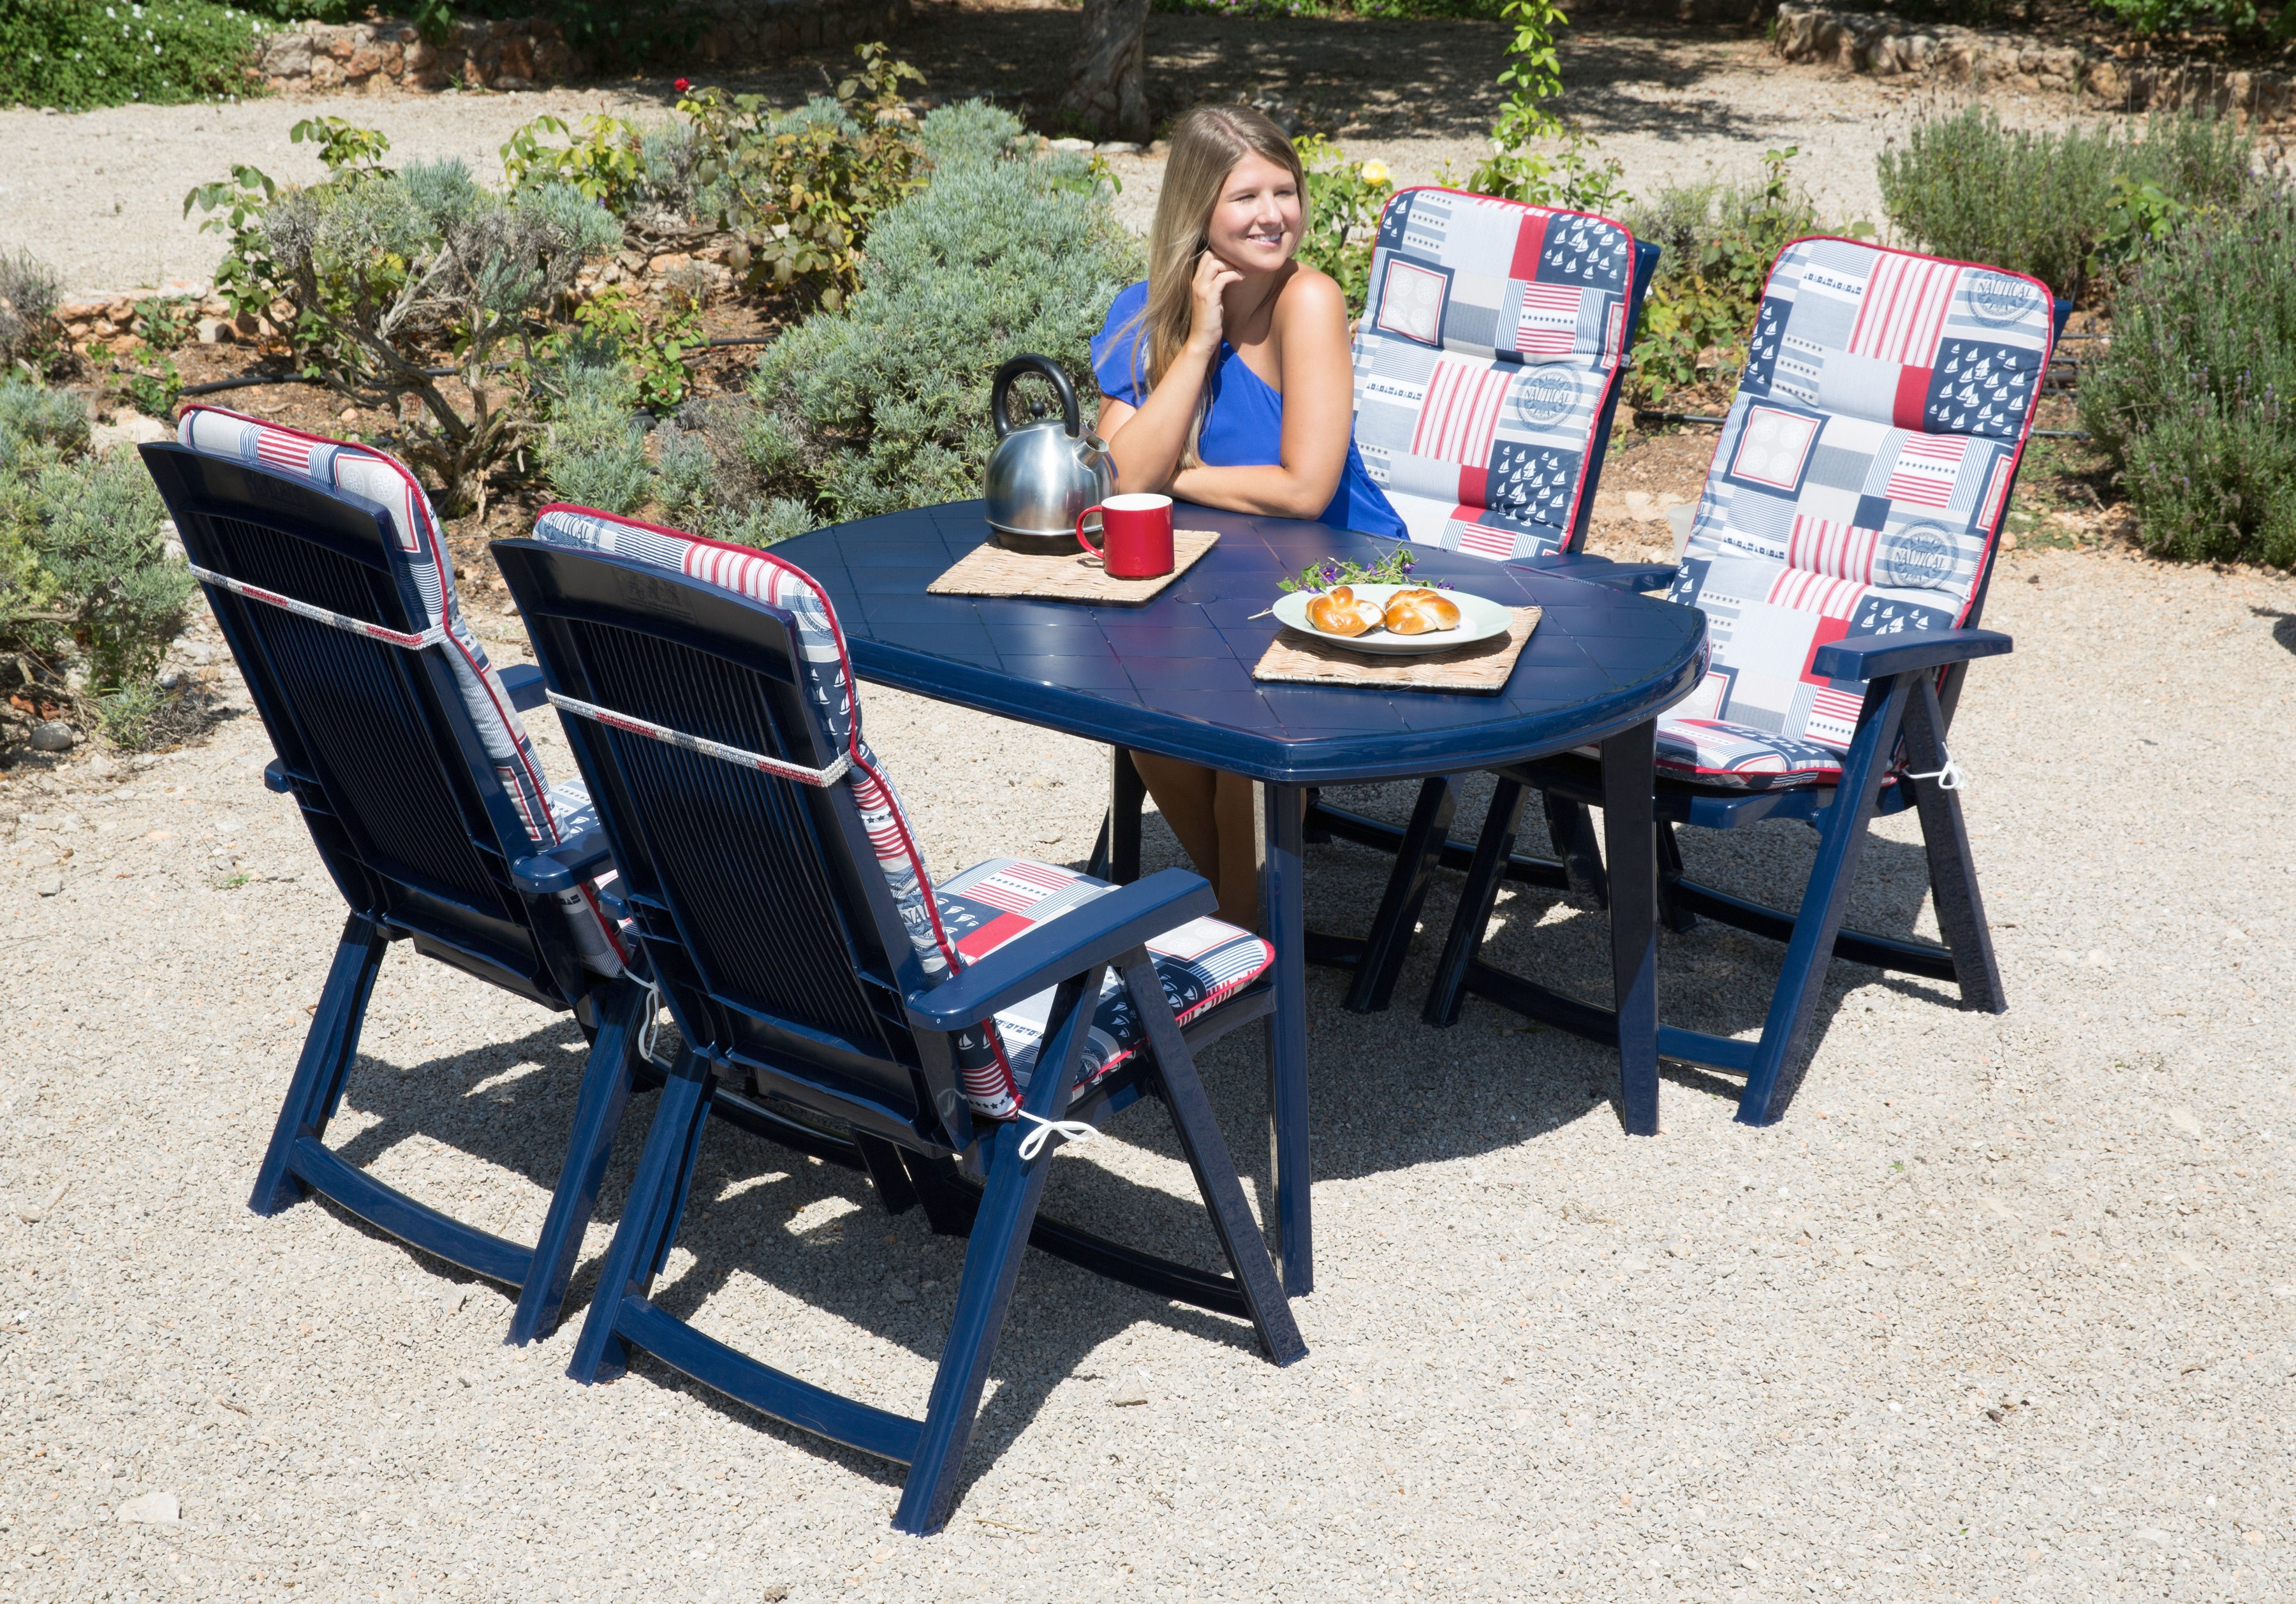 Best 9-tlg Gartenmöbelset Elise 4 Klappsessel Tisch 137x90 cm Kunststoff blau